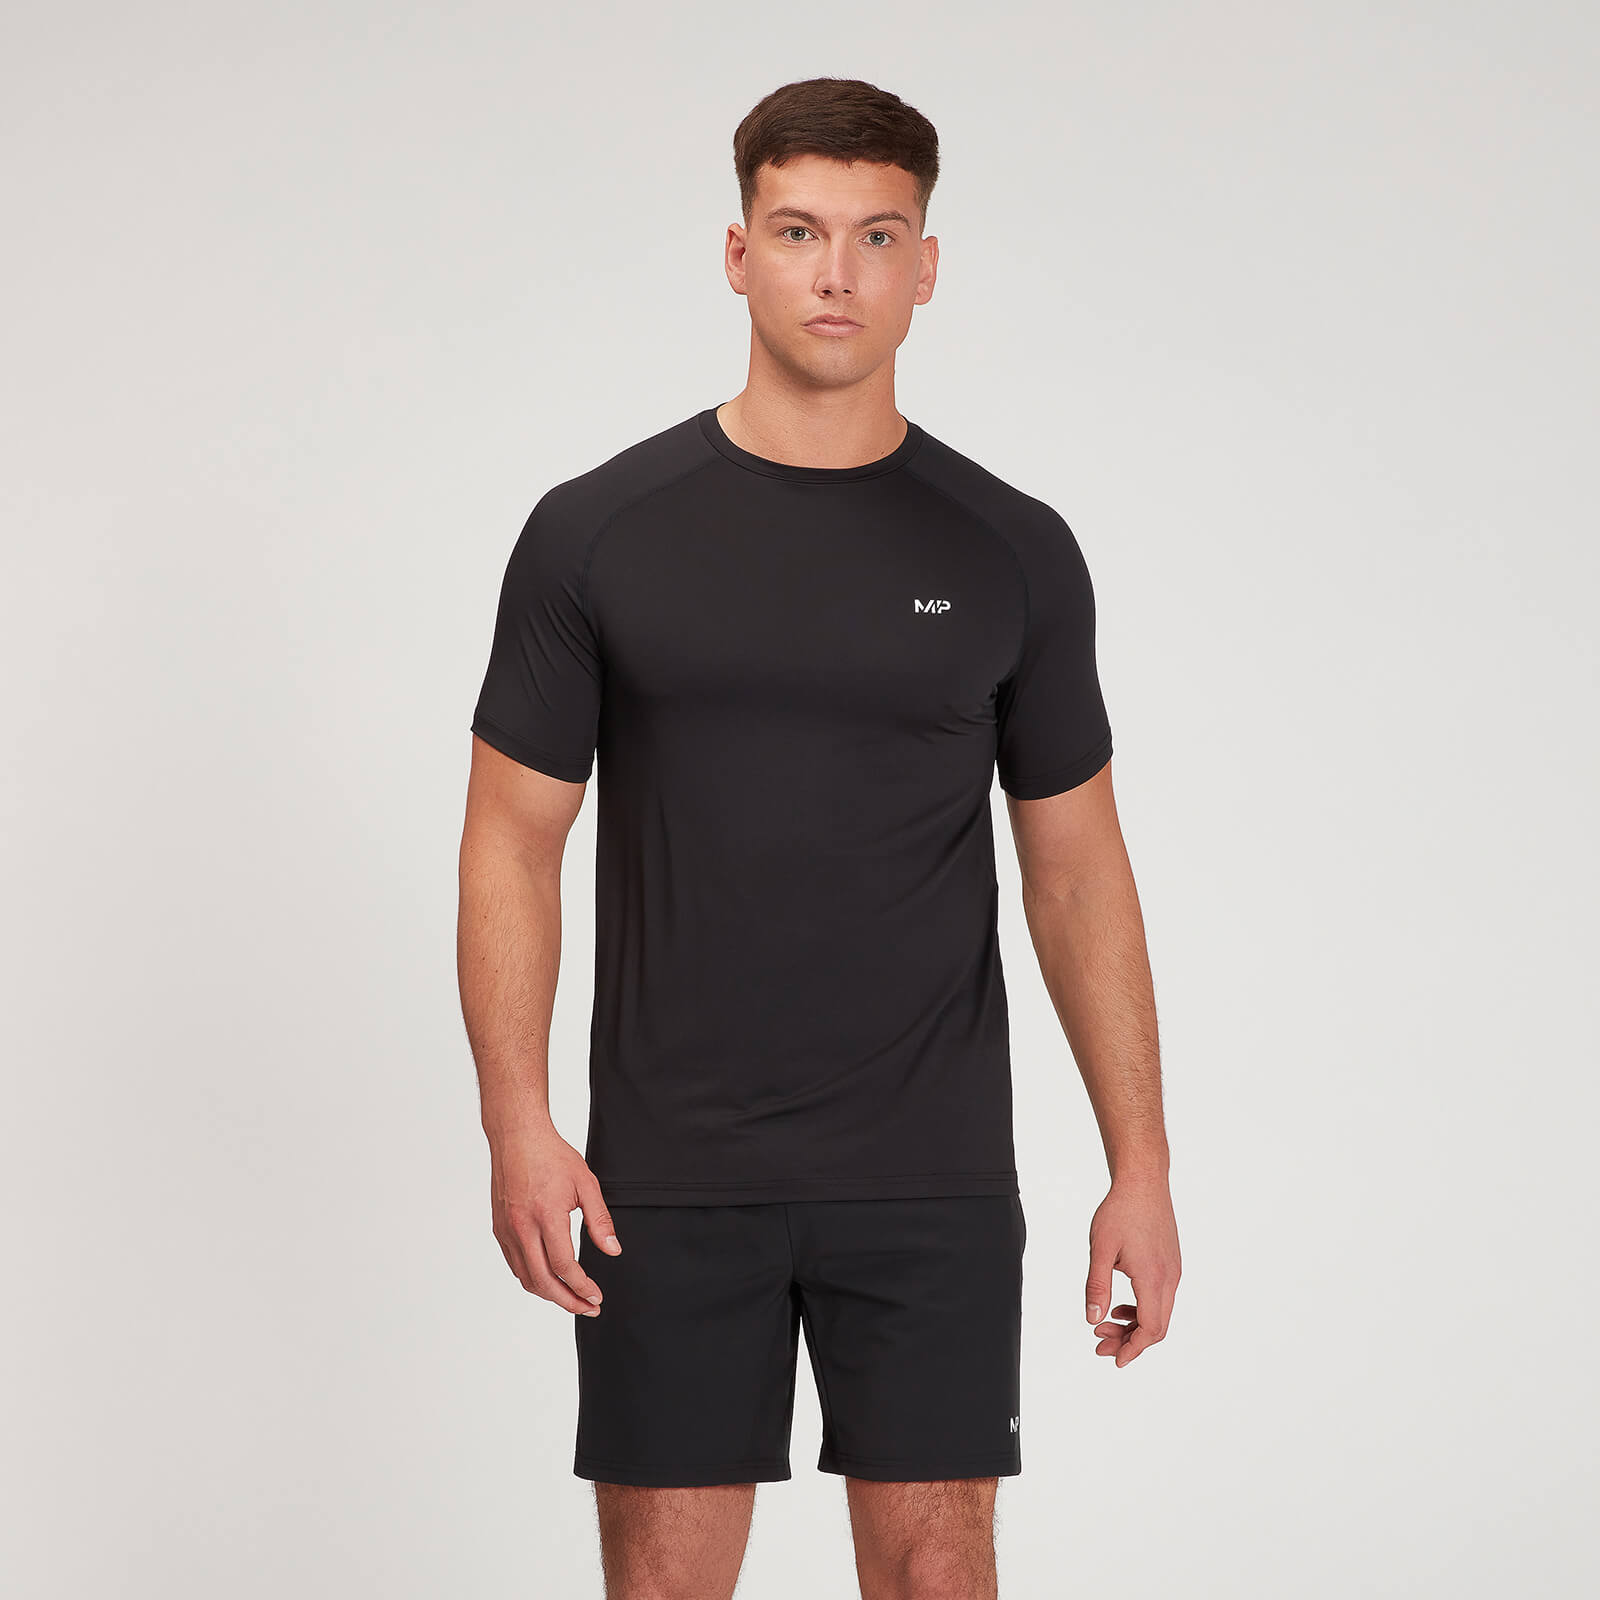 MP Men's Graphic Running Short Sleeve T-Shirt - Black - XXXL